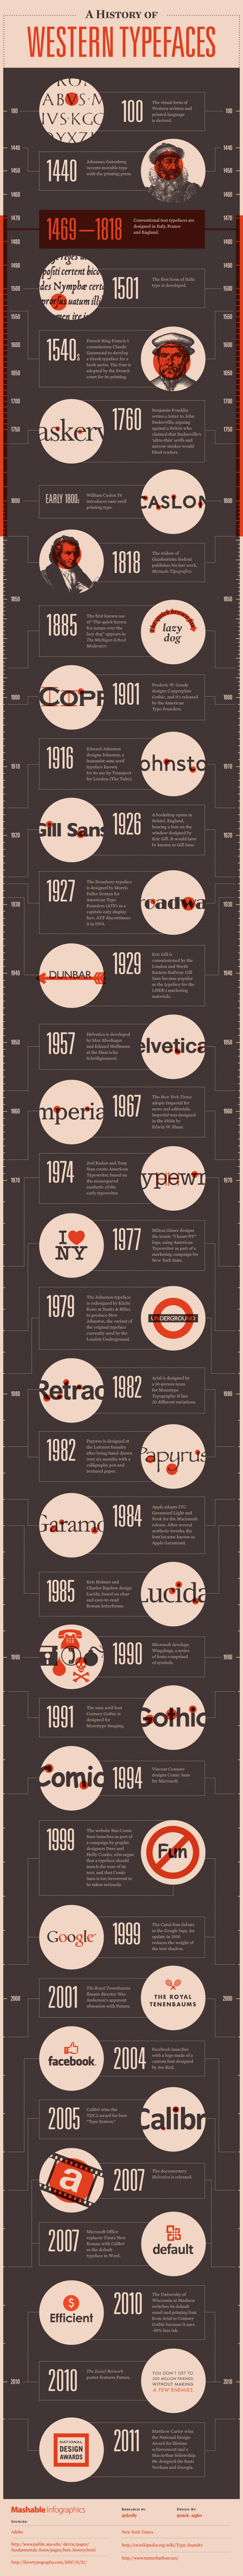 mashable_infographic_historywesterntypefaces1